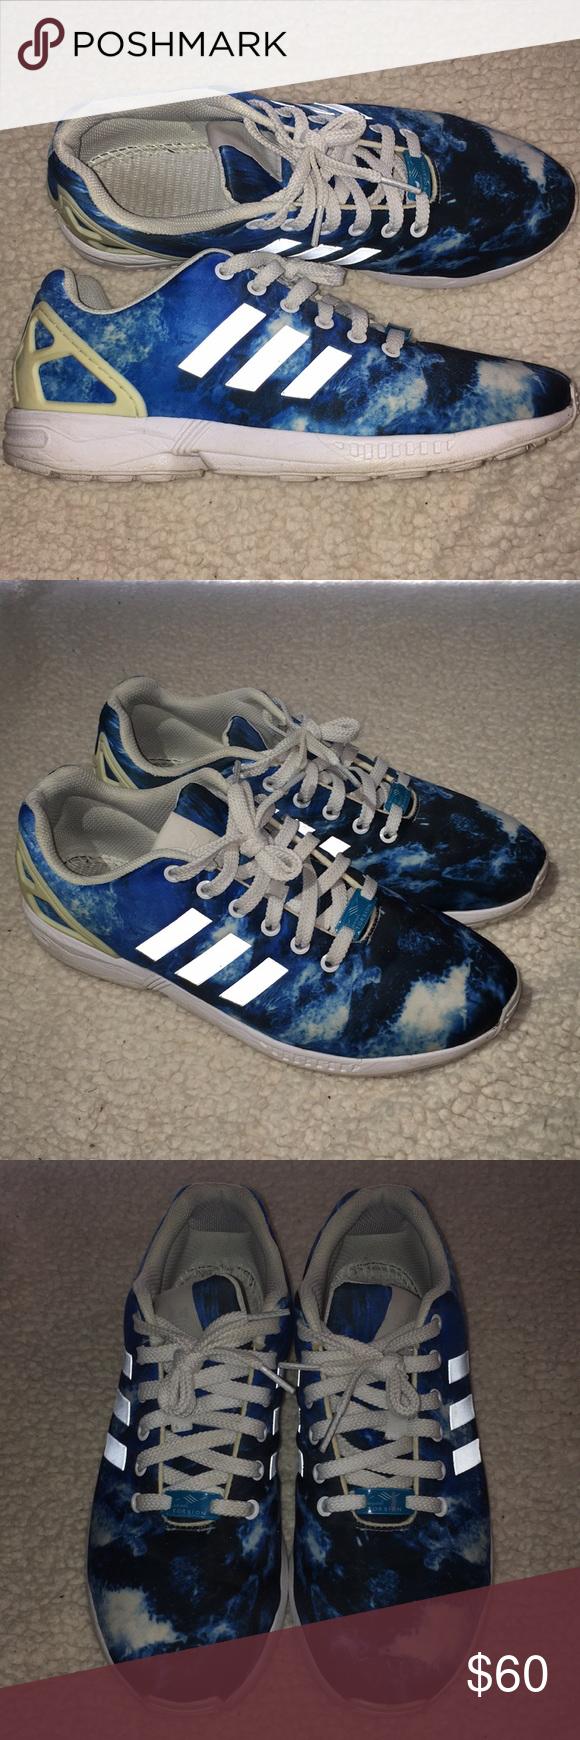 adidas zx flux ocean 9.5